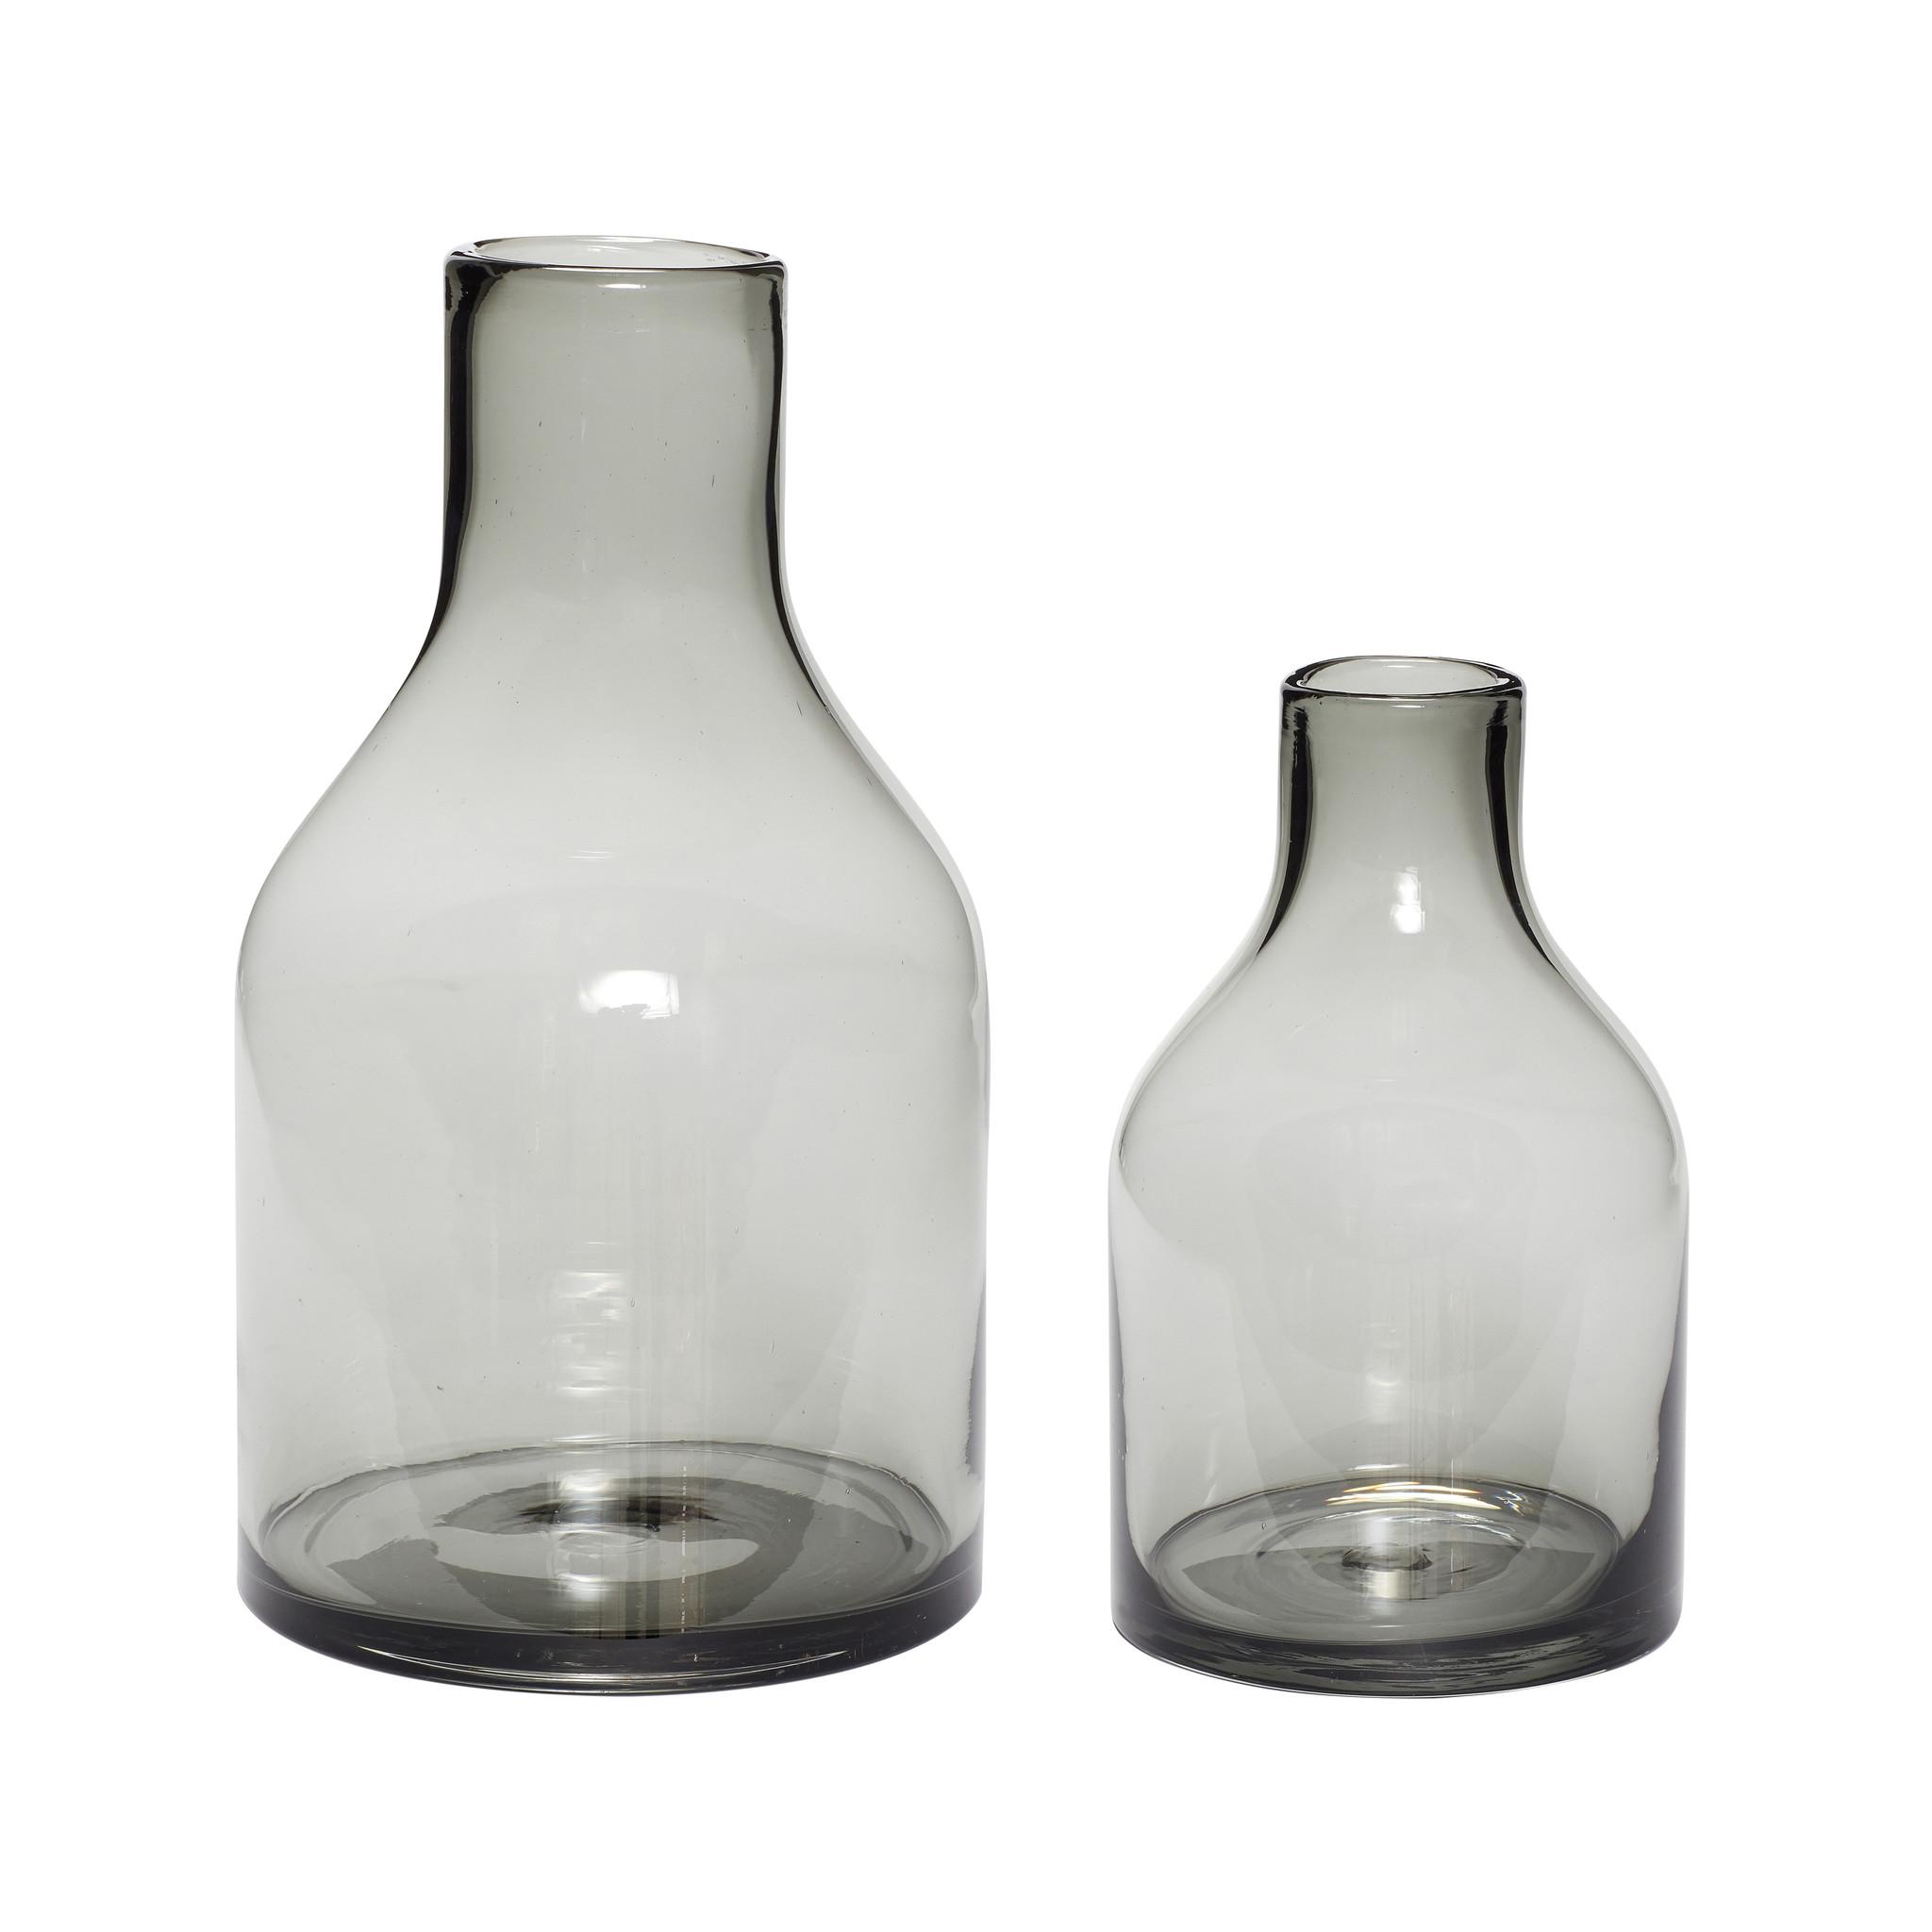 Hubsch Vaas, glas, gerookt, set van 2